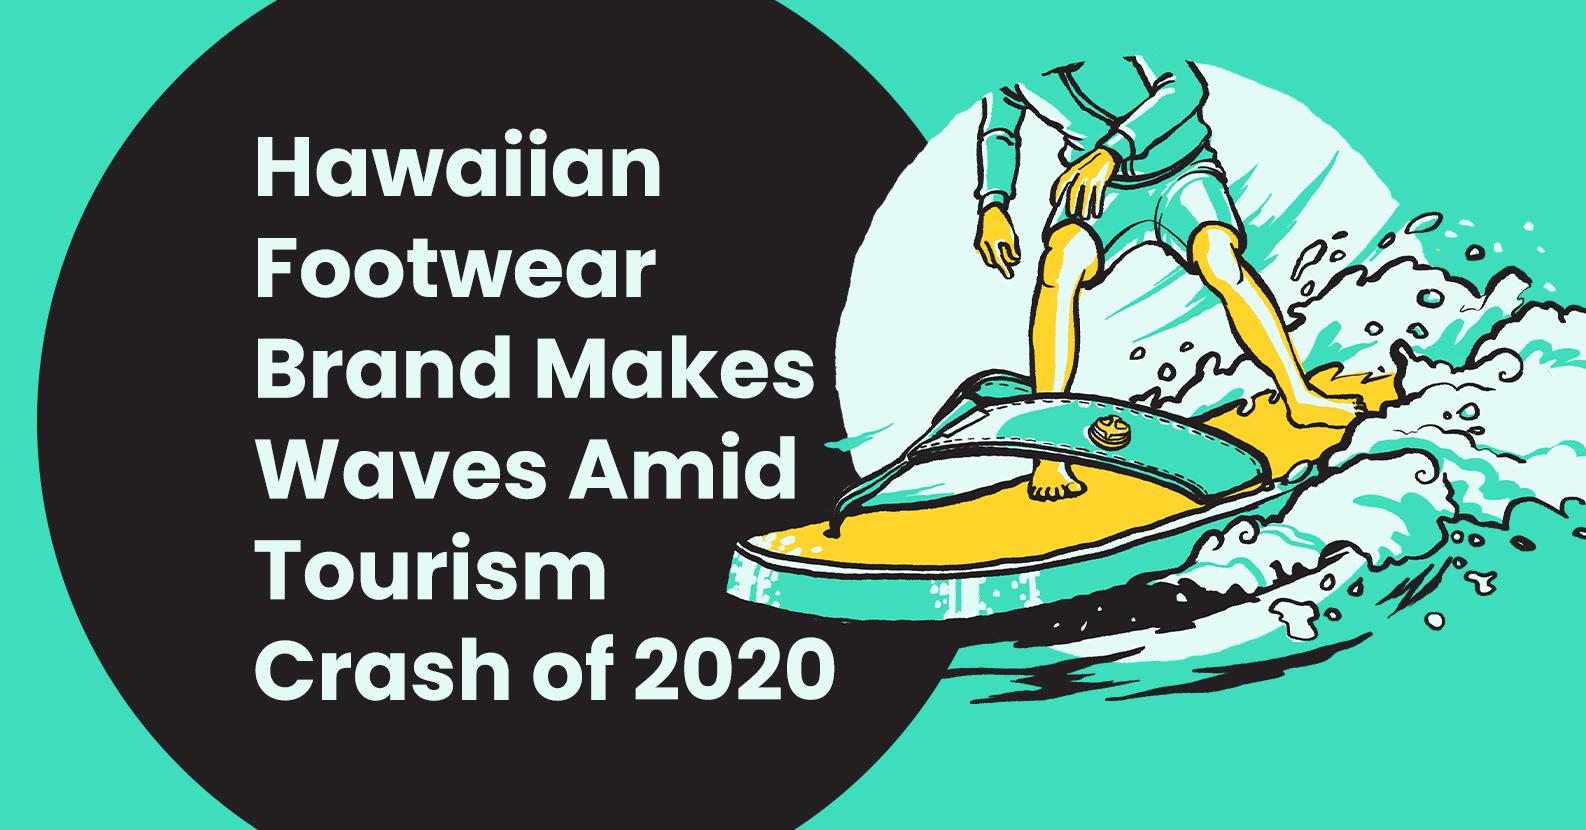 Hawaiian Footwear Brand Makes Waves Amid Tourism Crash of 2020